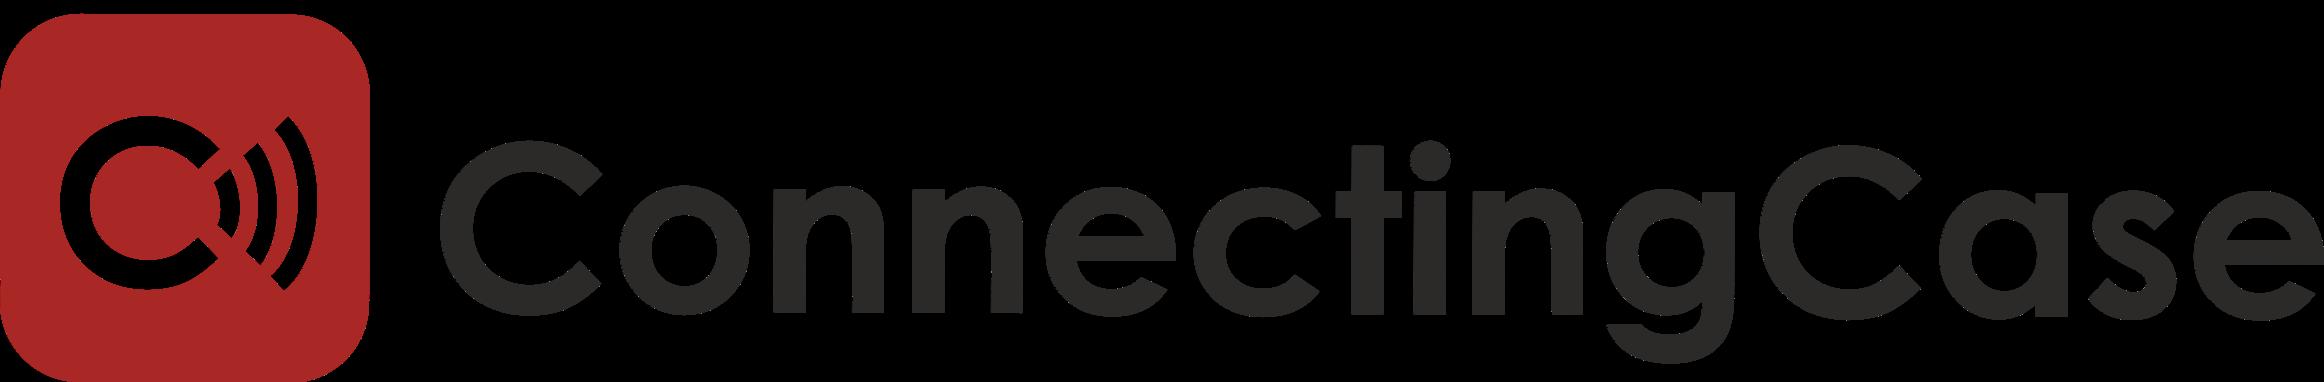 ConnectingCase